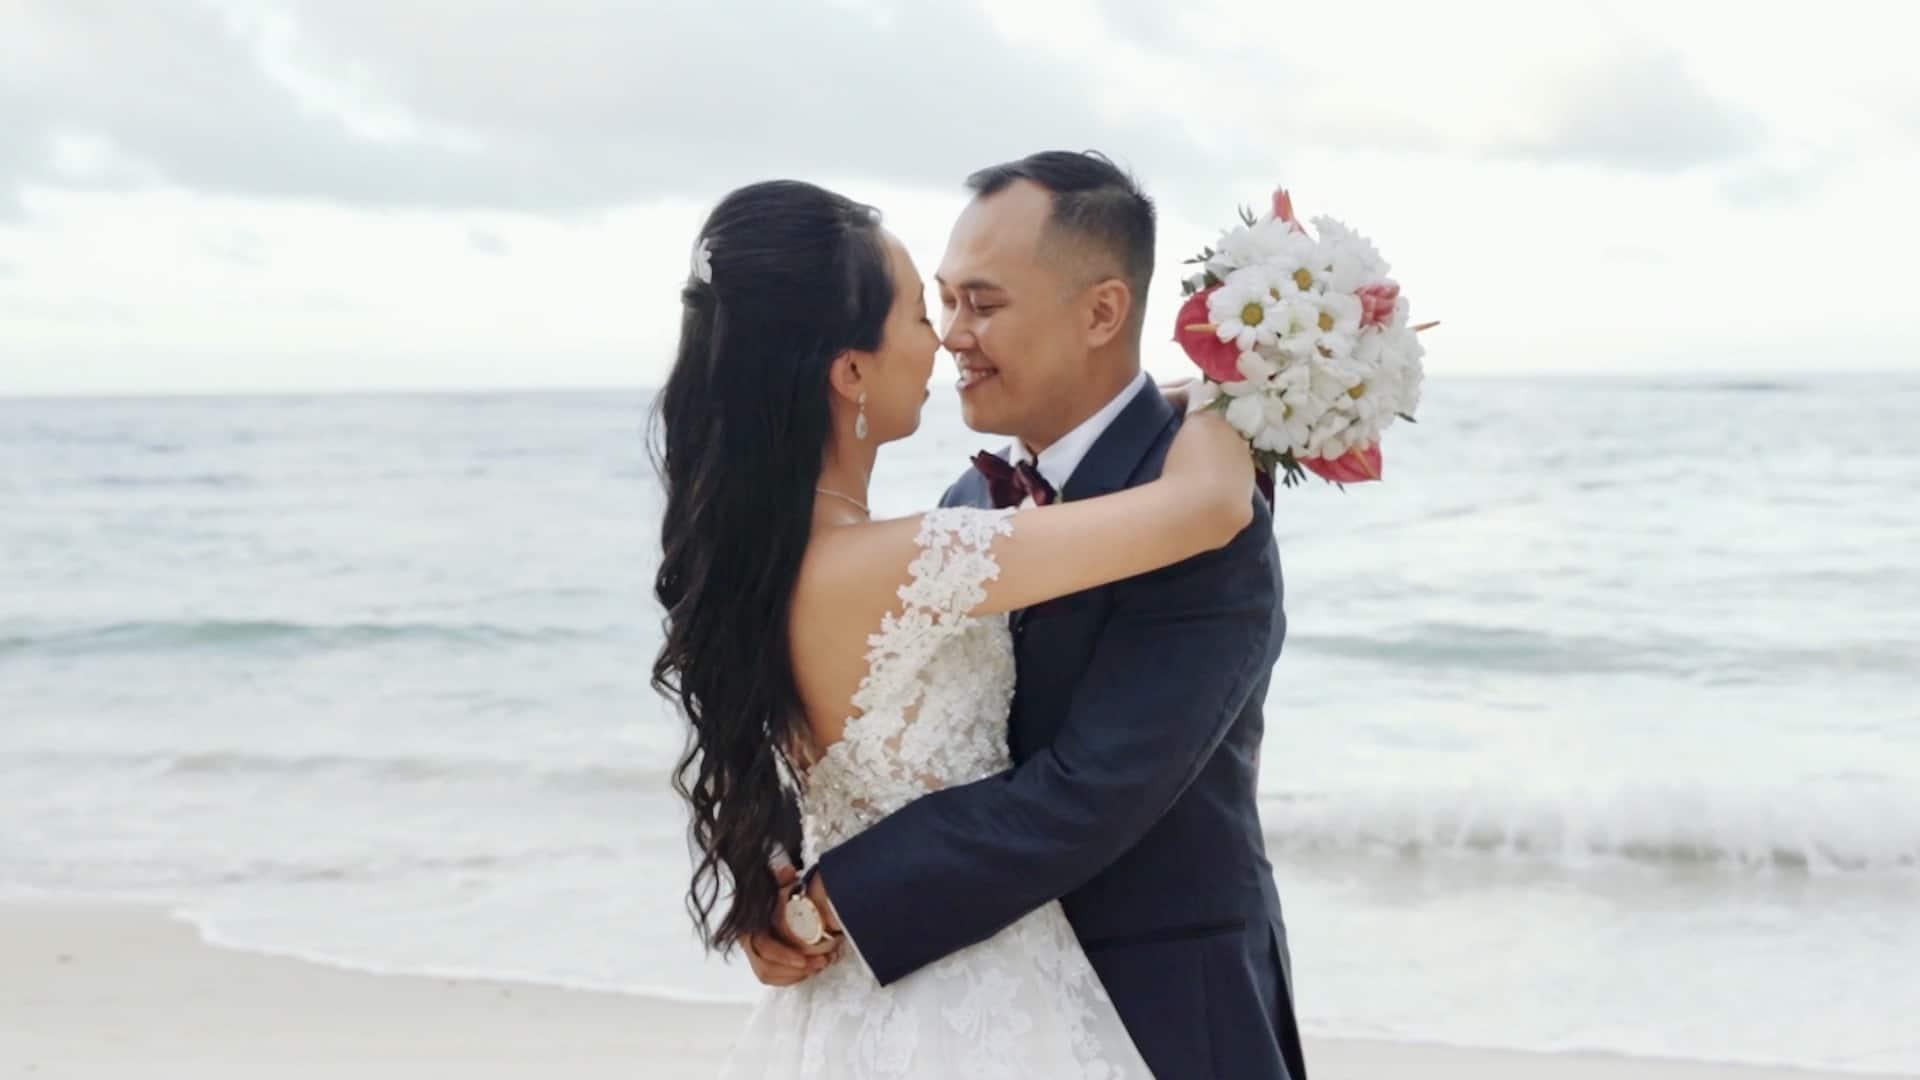 Everlasting Love - Beach Wedding Bride and Groom